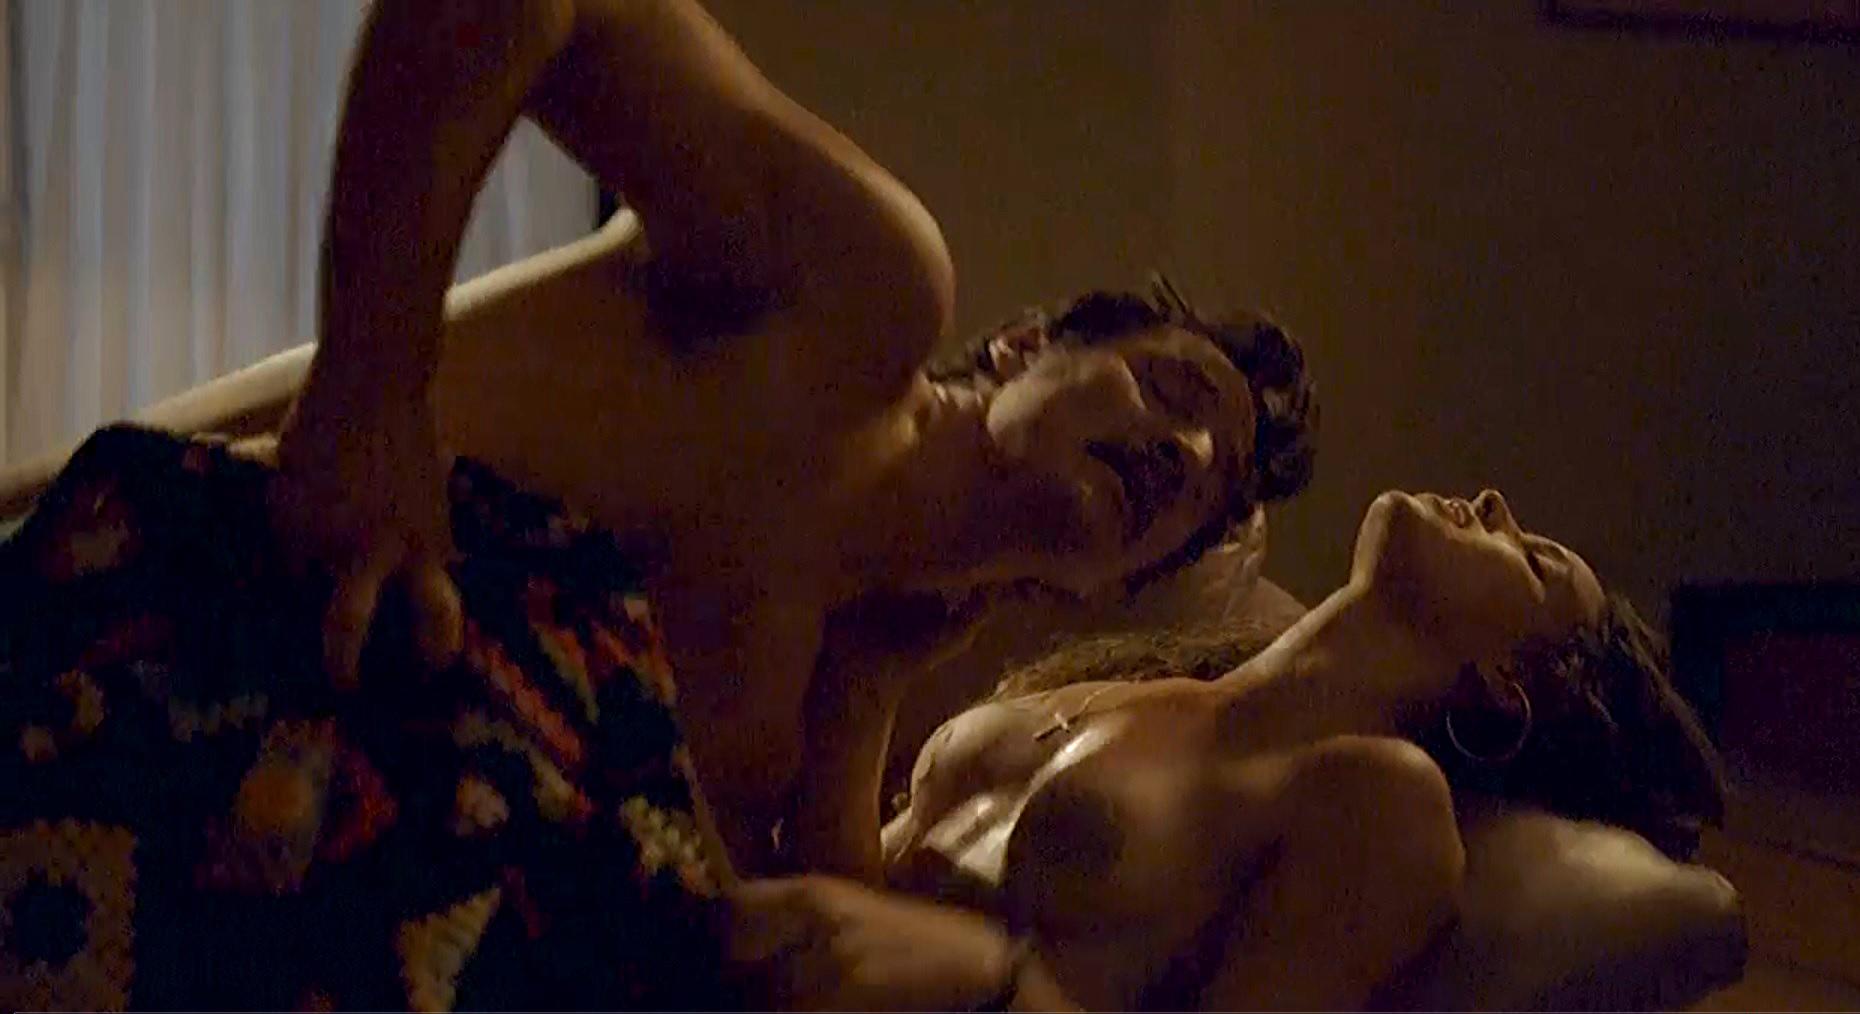 Adria Arjona Intensive Sex From Narcos - Scandalpost-6282